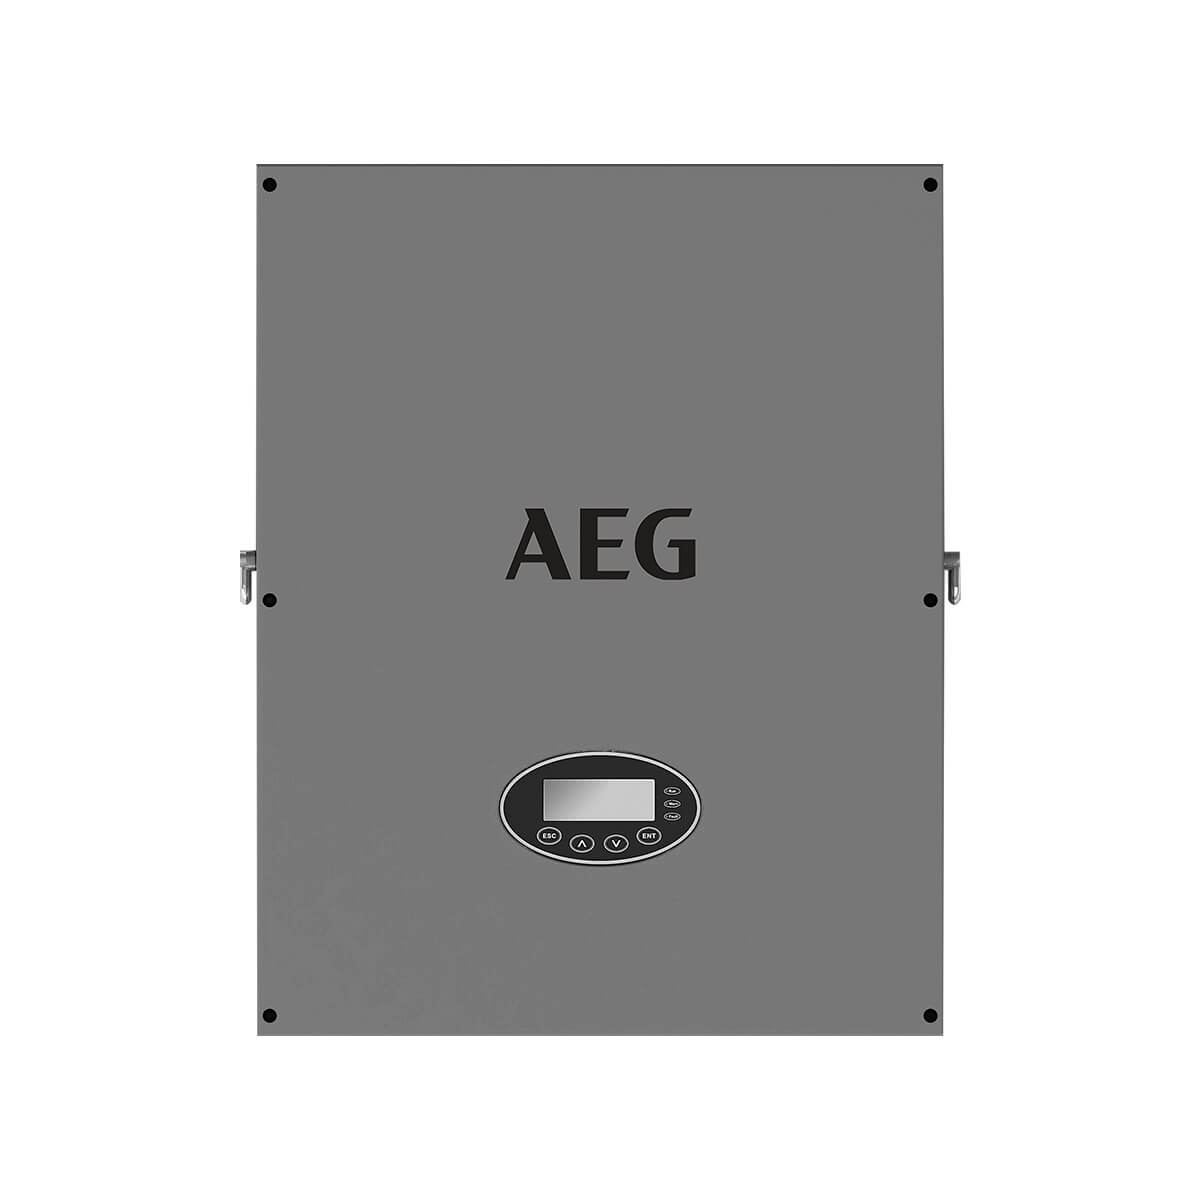 aeg 60kW inverter, aeg as-ic01 60kW inverter, aeg as-ic01-60000-2 inverter, aeg as-ic01-60000-2, aeg as-ic01 60kW, AEG 60 KW